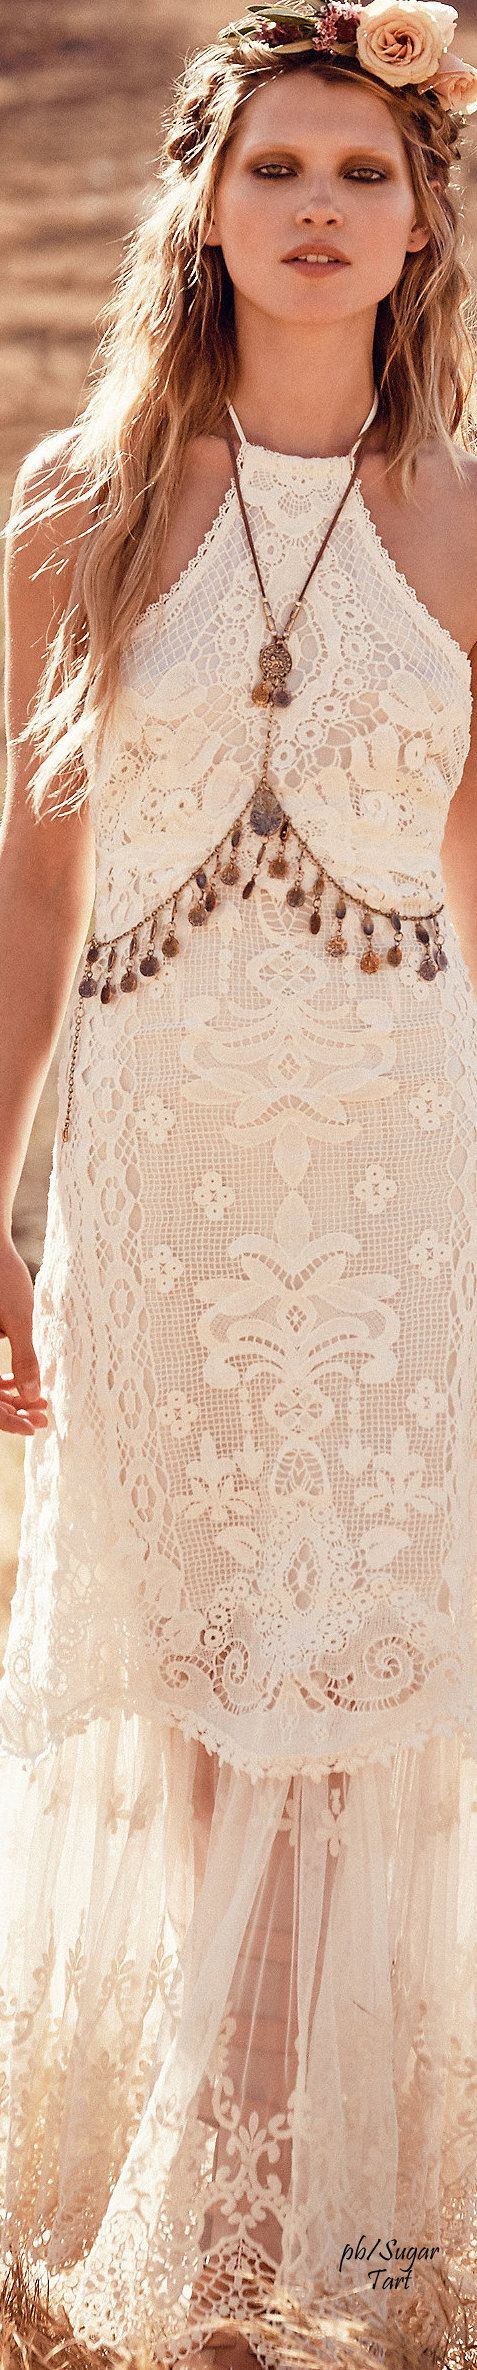 Hippie boho bohemian dress. For more follow www.pinterest.com/ninayay and stay positively #pinspired #pinspire @ninayay